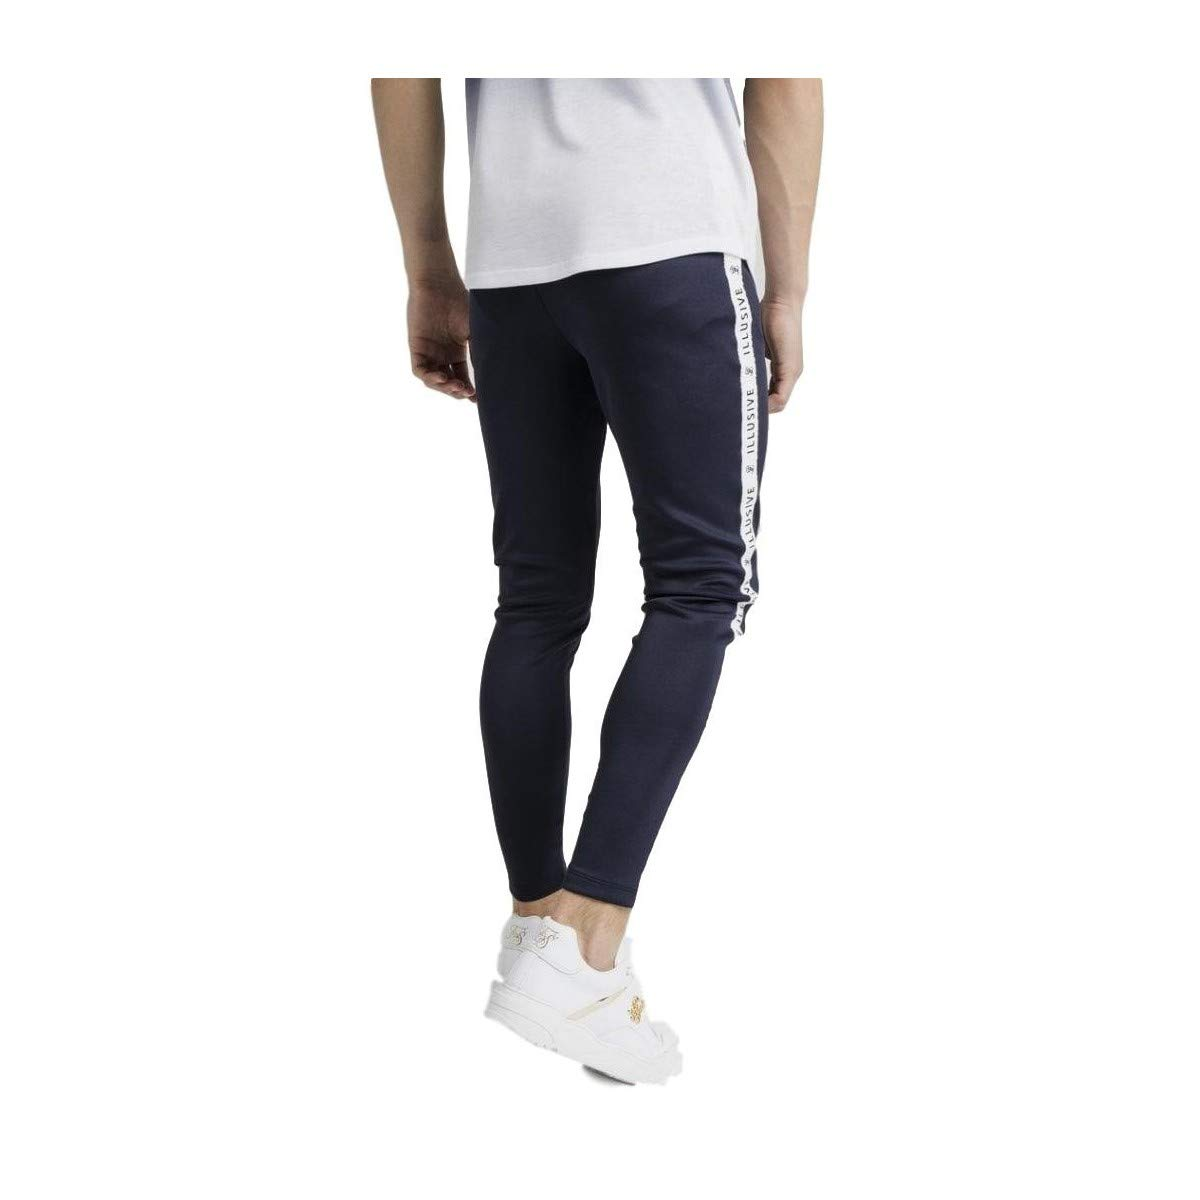 Illusive London Pantalon Taped Azul Marino: Amazon.es: Ropa y ...